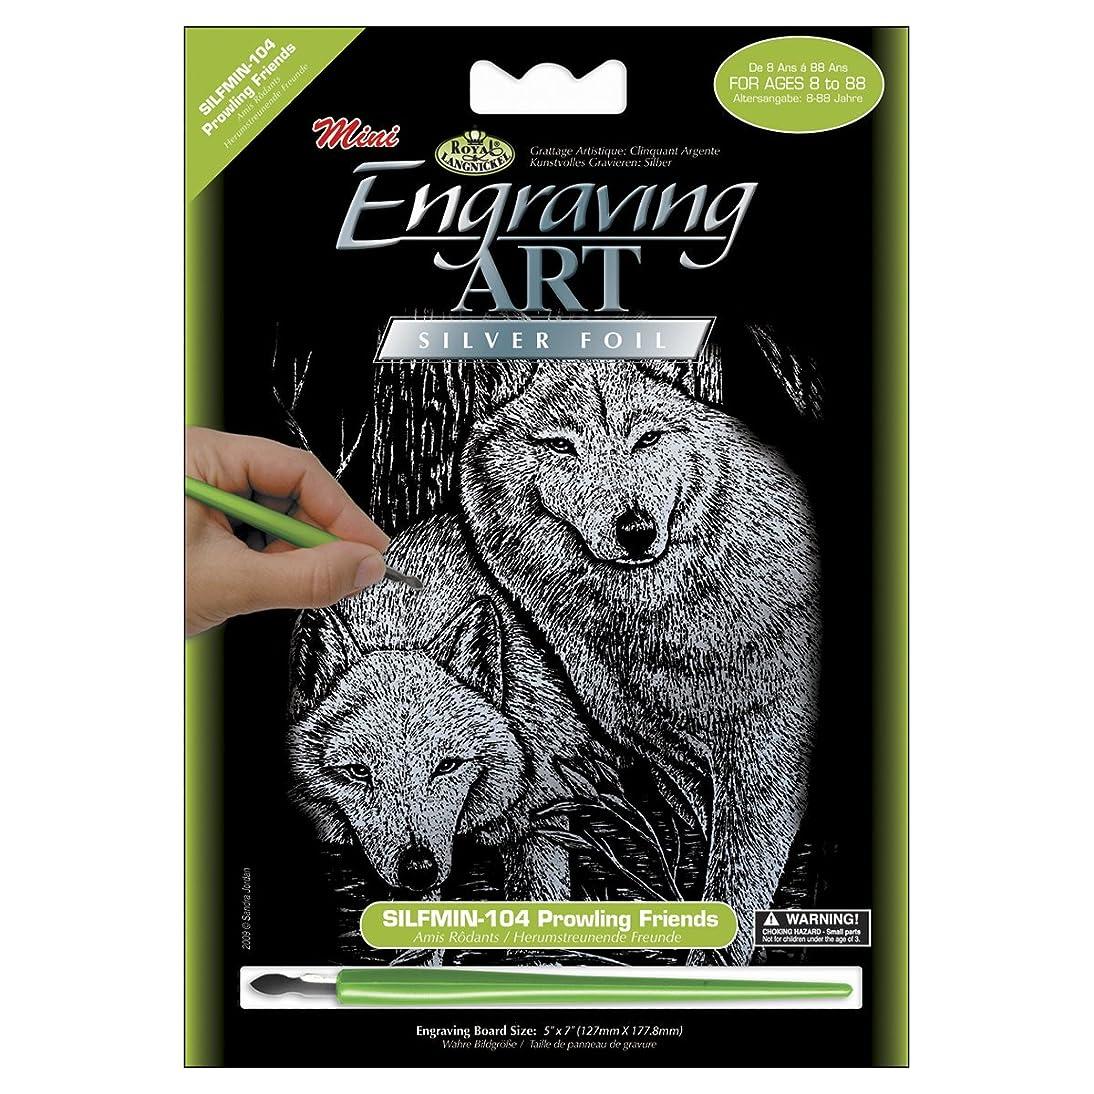 Royal Brush Mini Silver Foil Engraving Art Kit 5 by 7-Inch, Prowling Friends